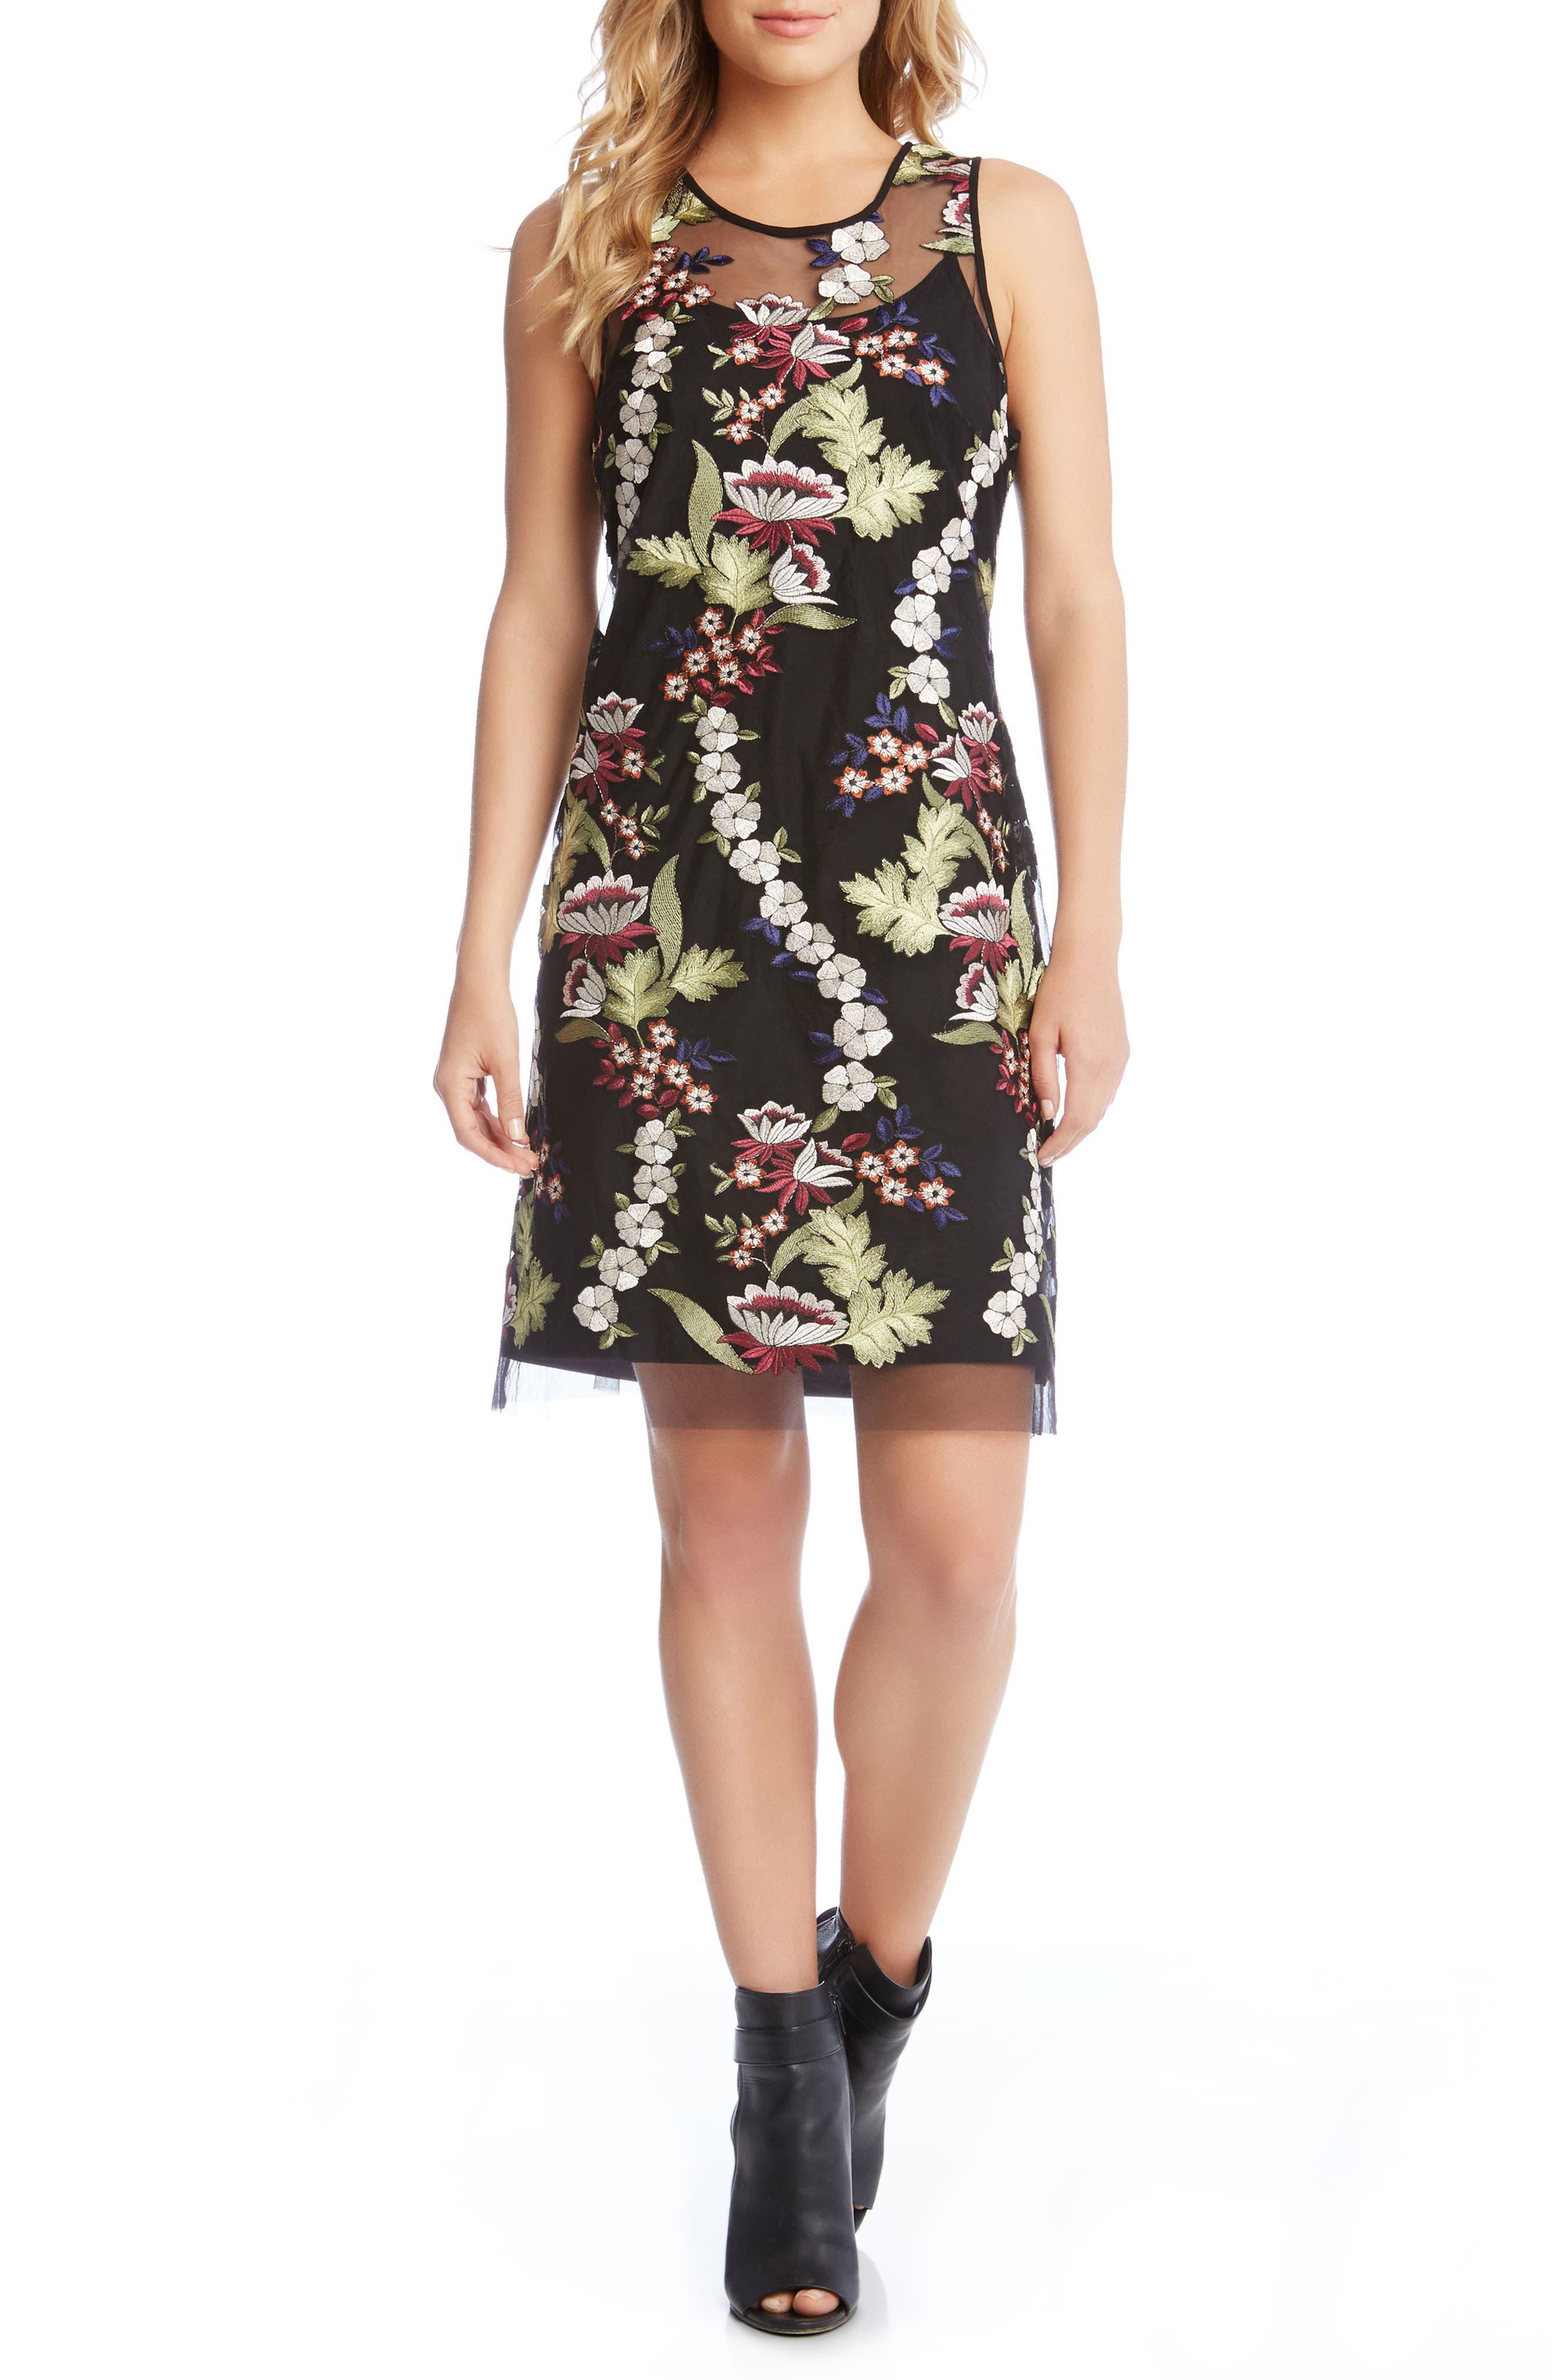 Main Image - Karen Kane Floral Embroidery A-Line Dress